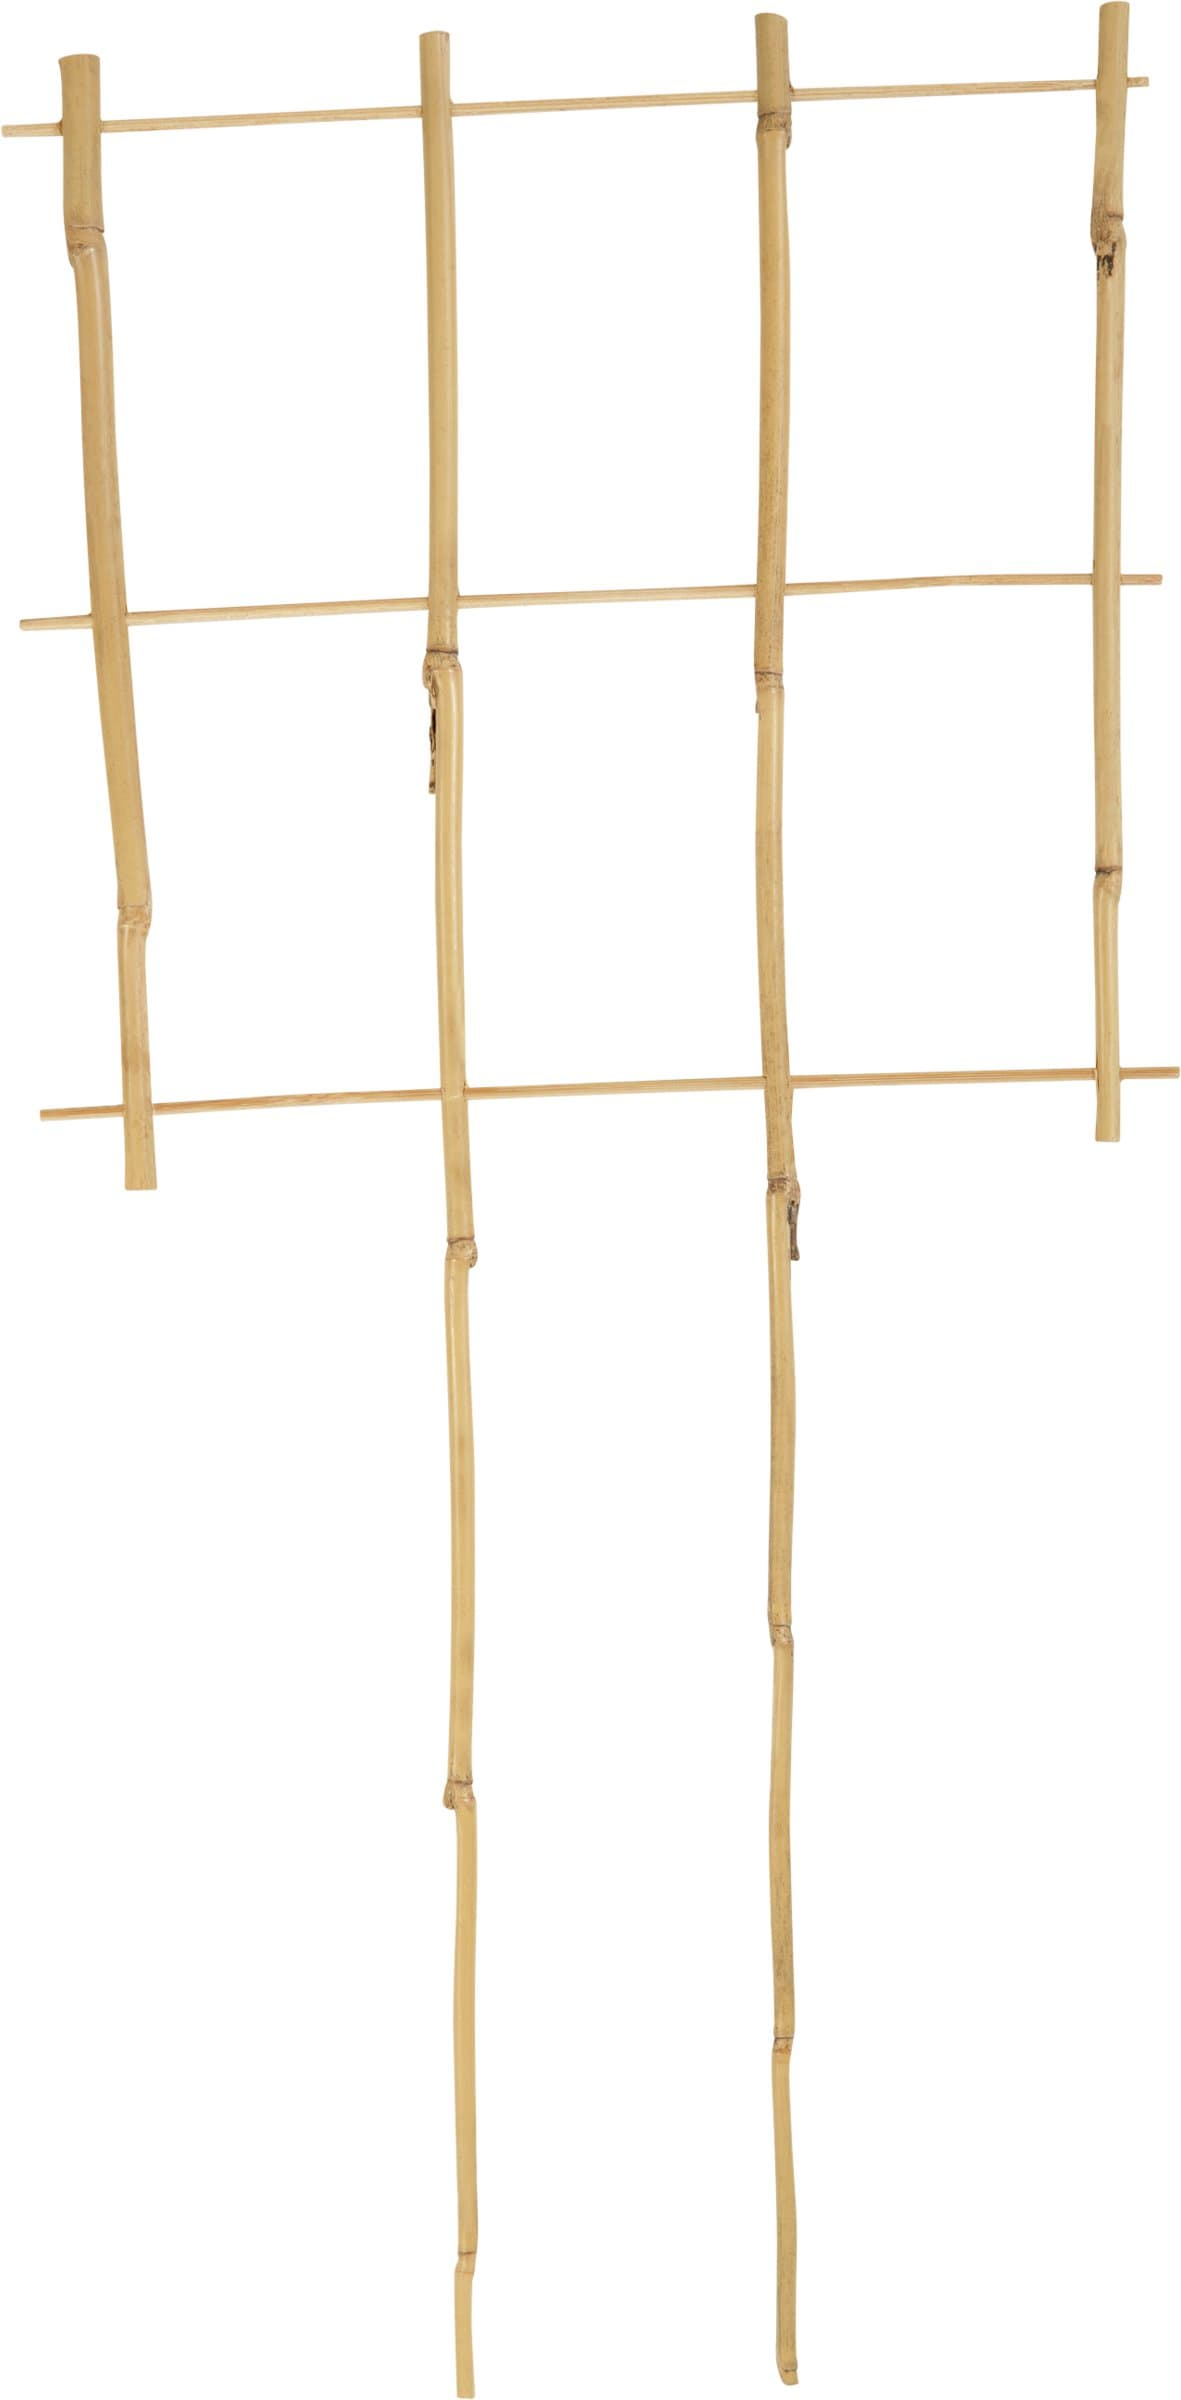 Windhager Puntelli per pianti di bambù Asta per piante